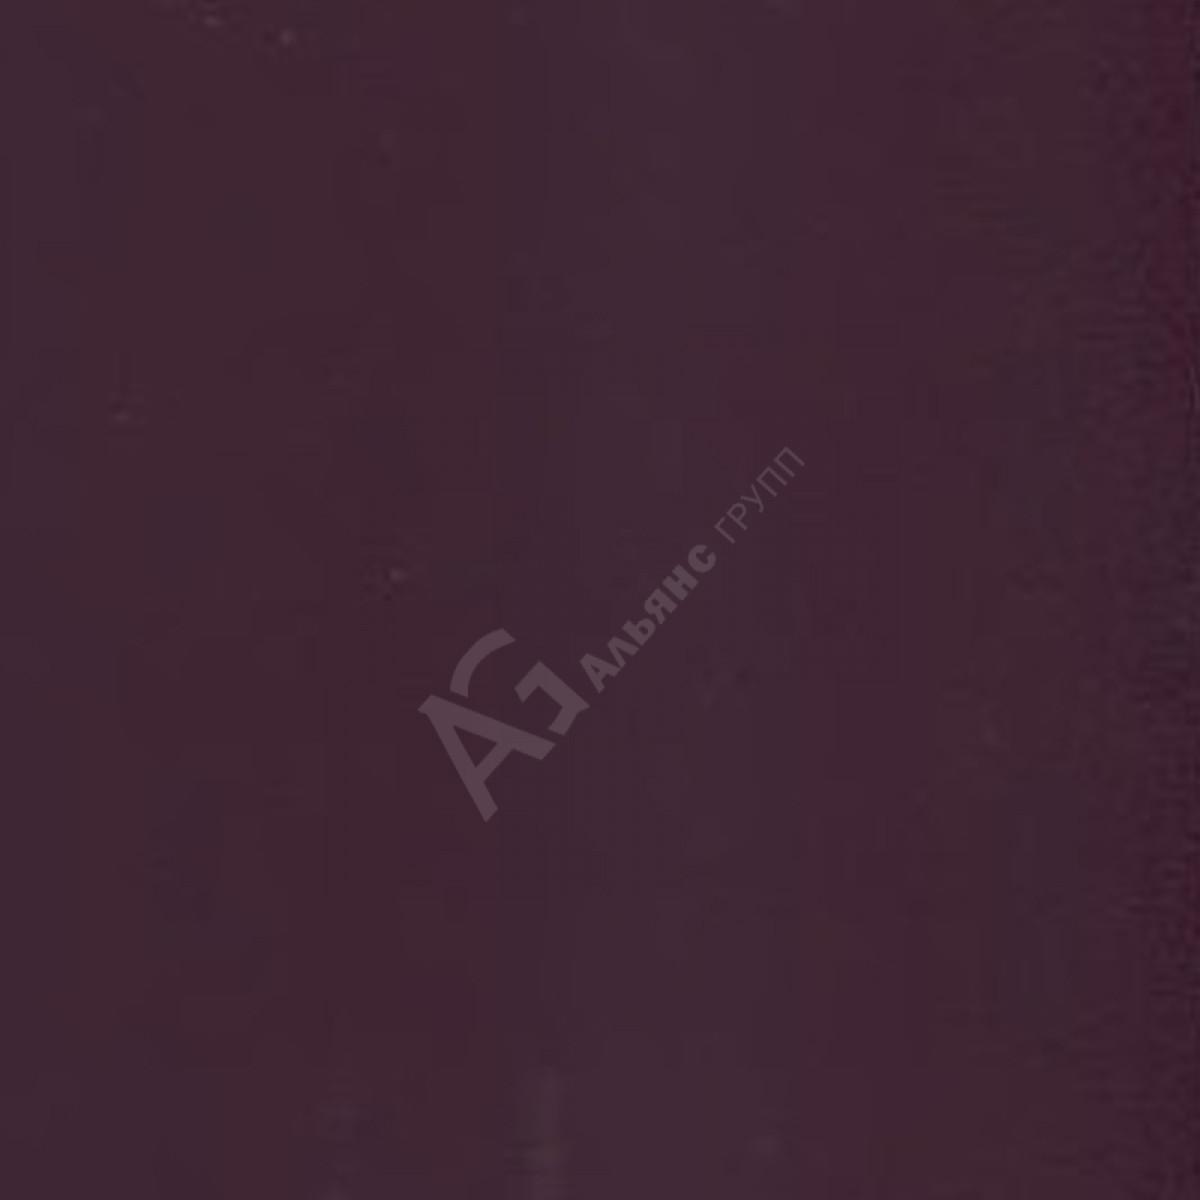 Баклажан (глянец) 001